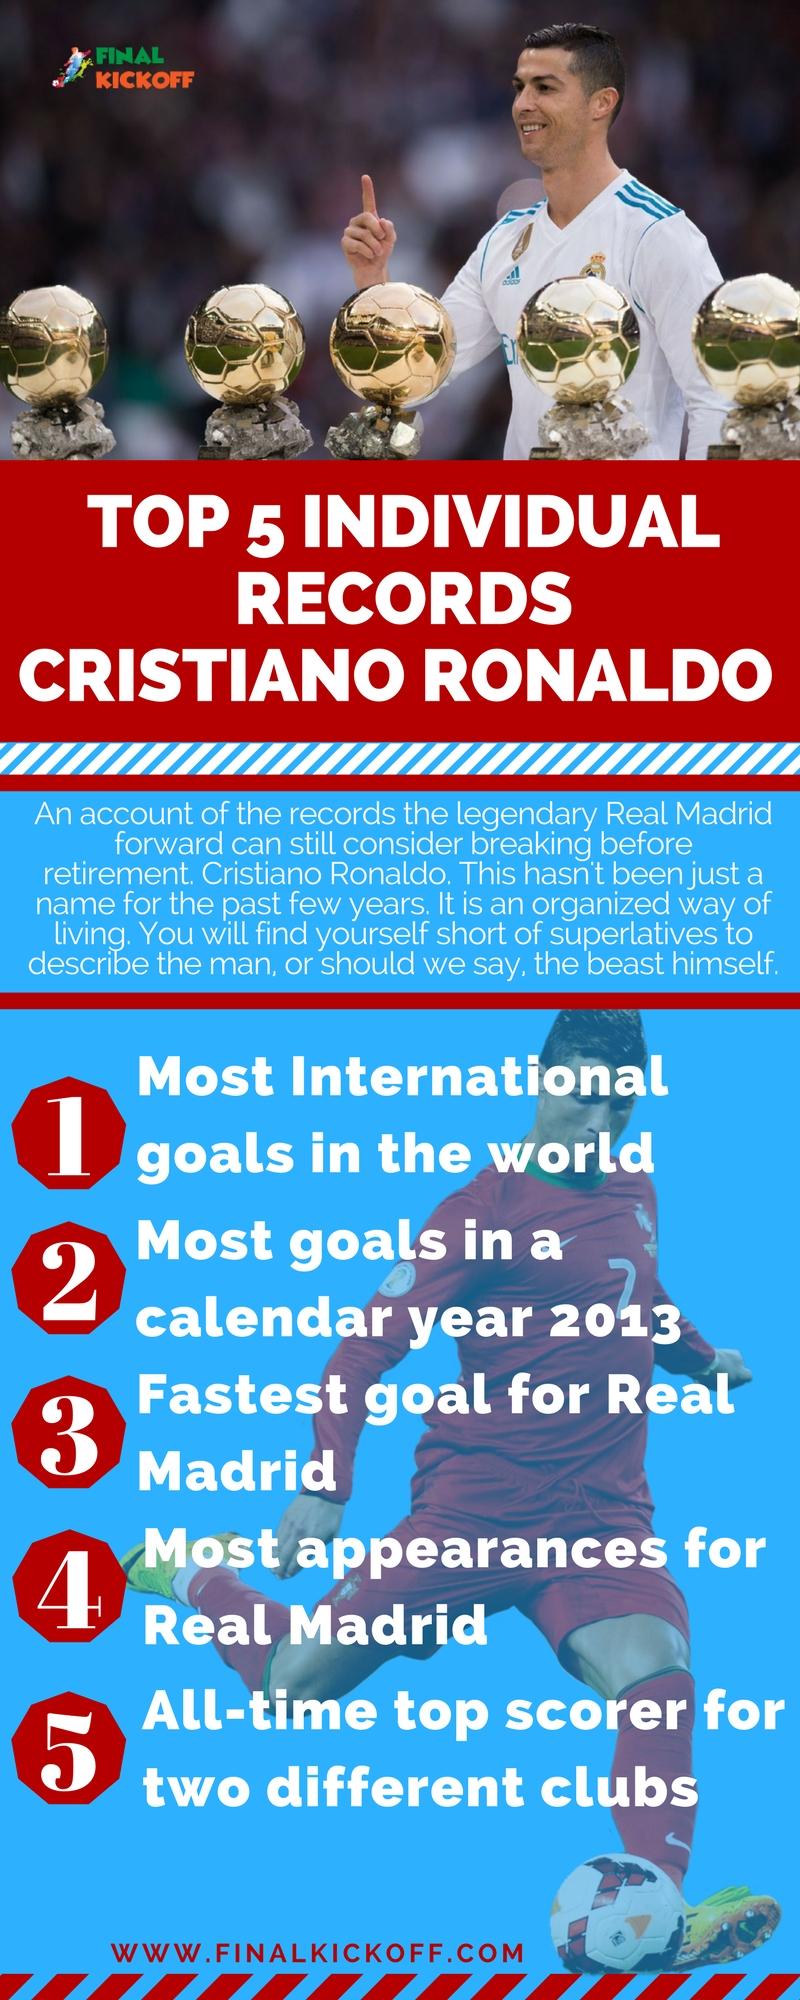 Top 5 Individual Records Cristiano Ronaldo Is Yet To Break